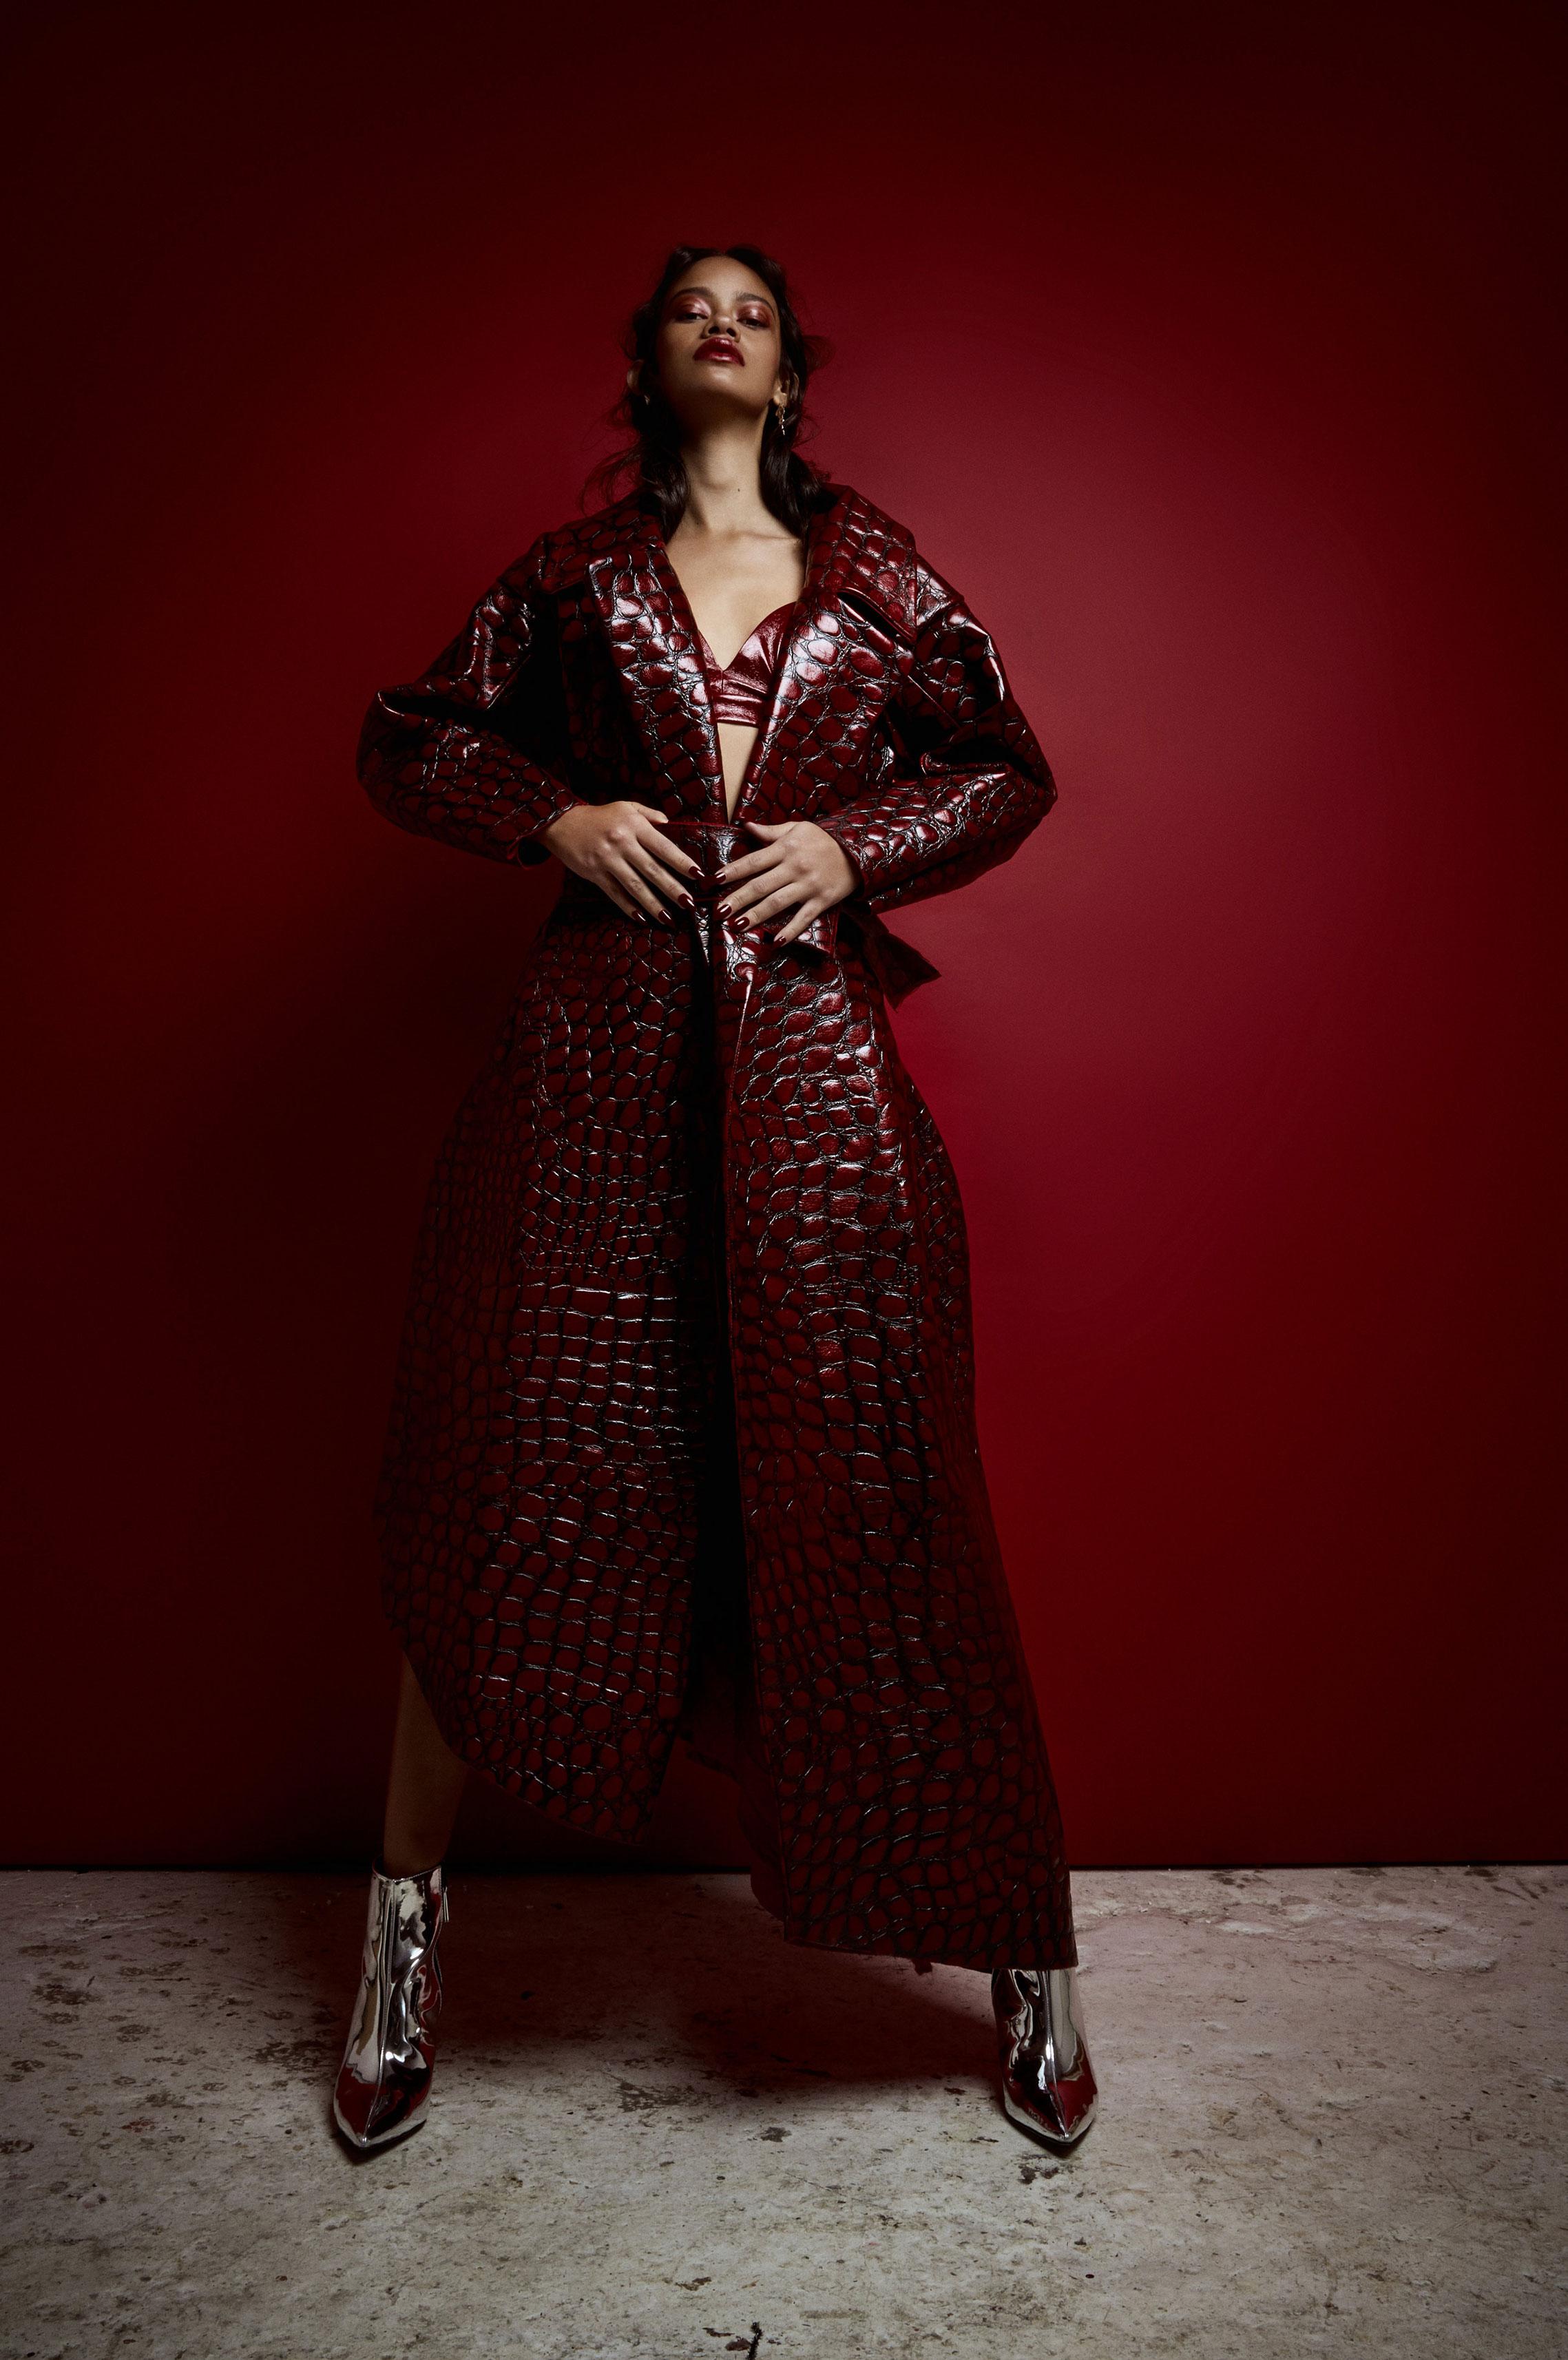 Таис Мартинс - женщина в красном / фото 04